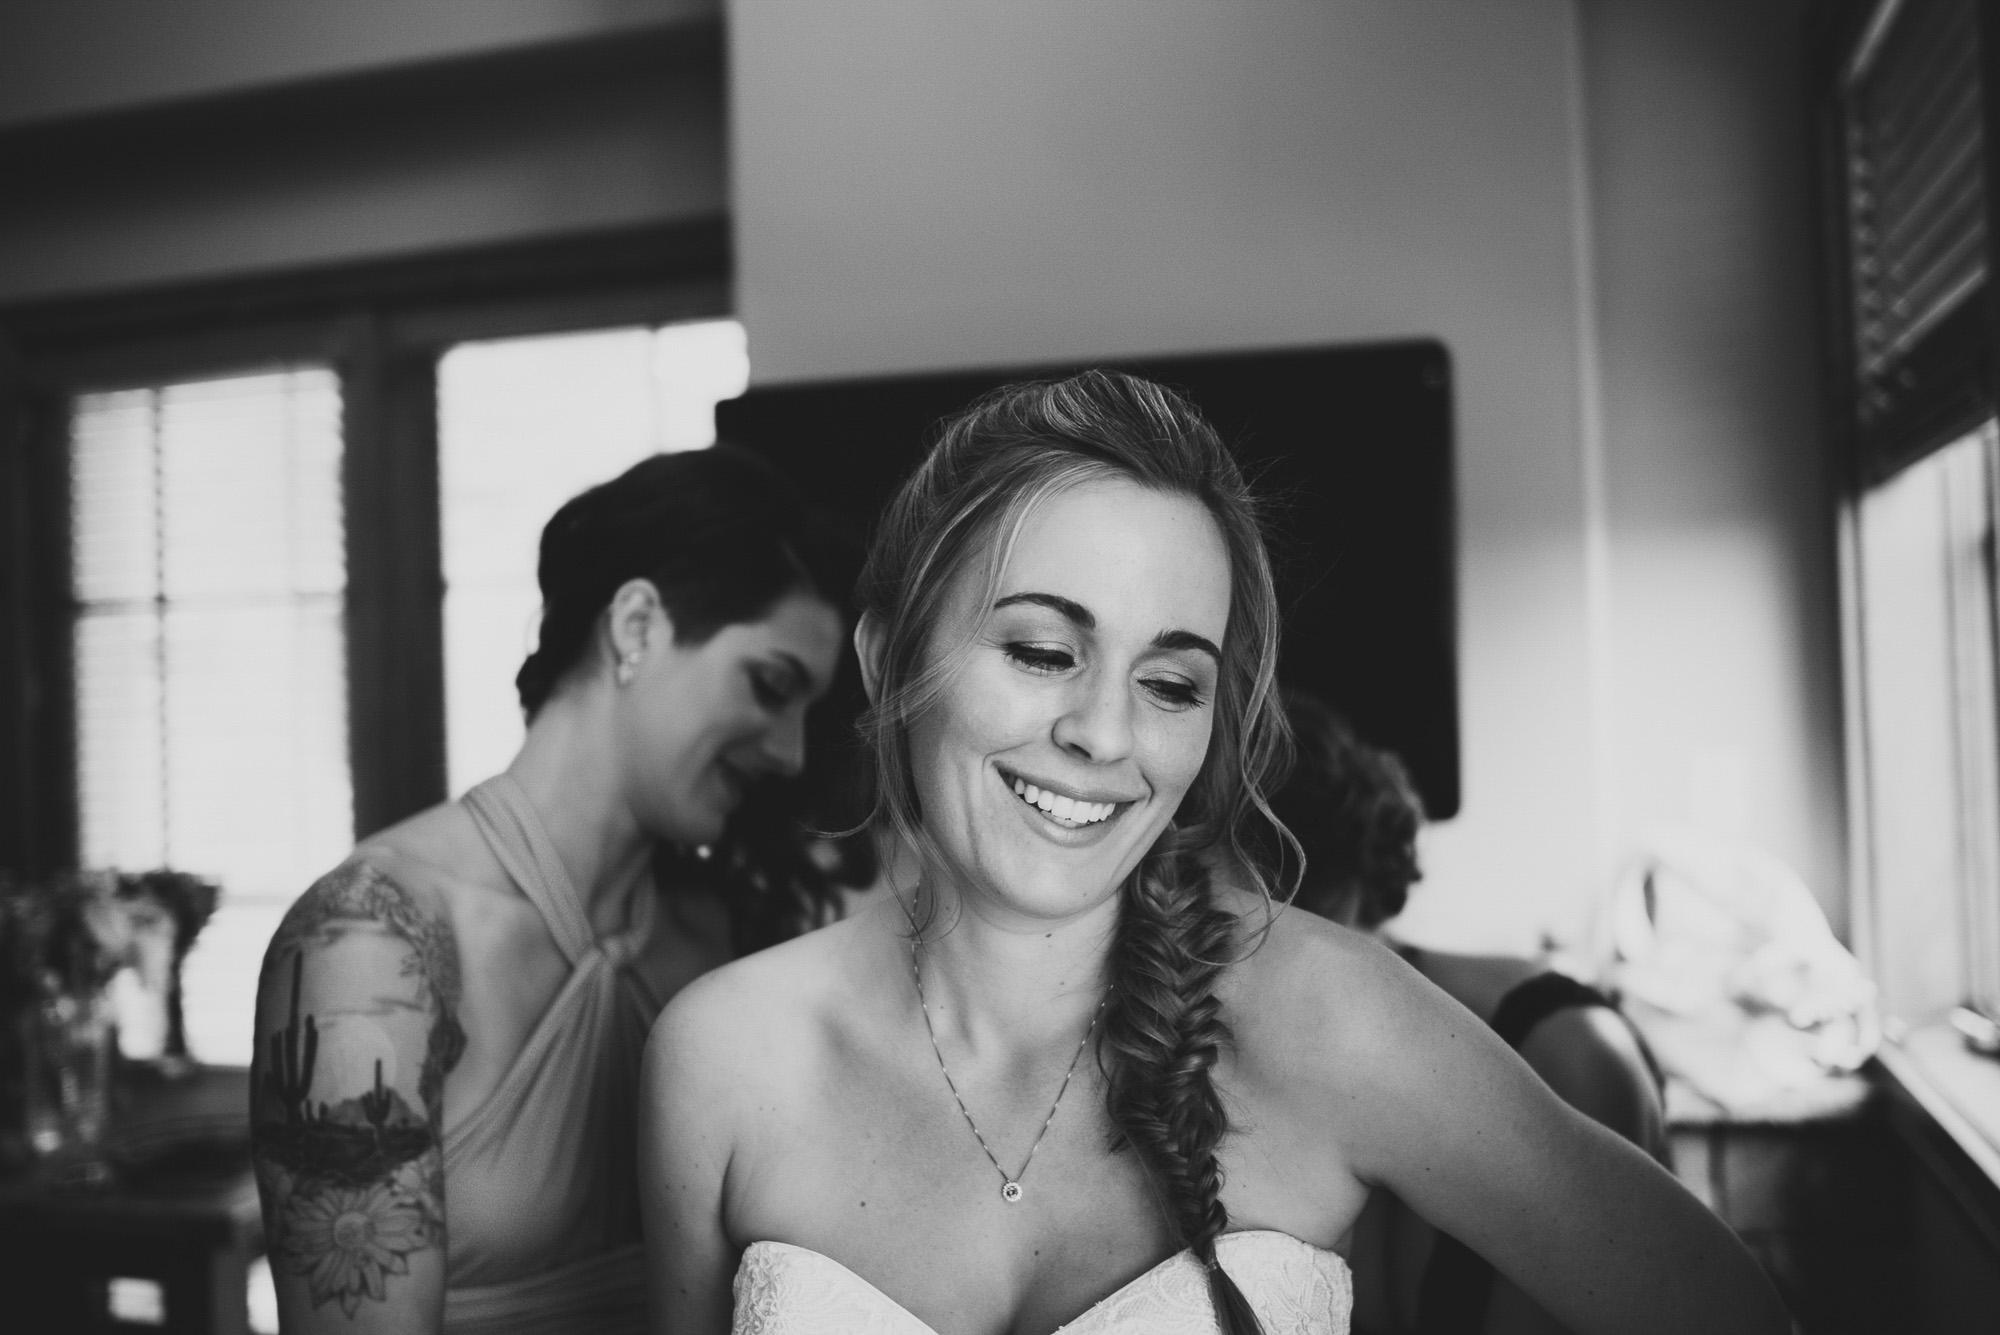 142elopement-photographer-colorado-telluride_wedding_photographer_colorado_mountain_wedding_photographer_brie&tyler_0532_vintage_black_and_white_film.jpg